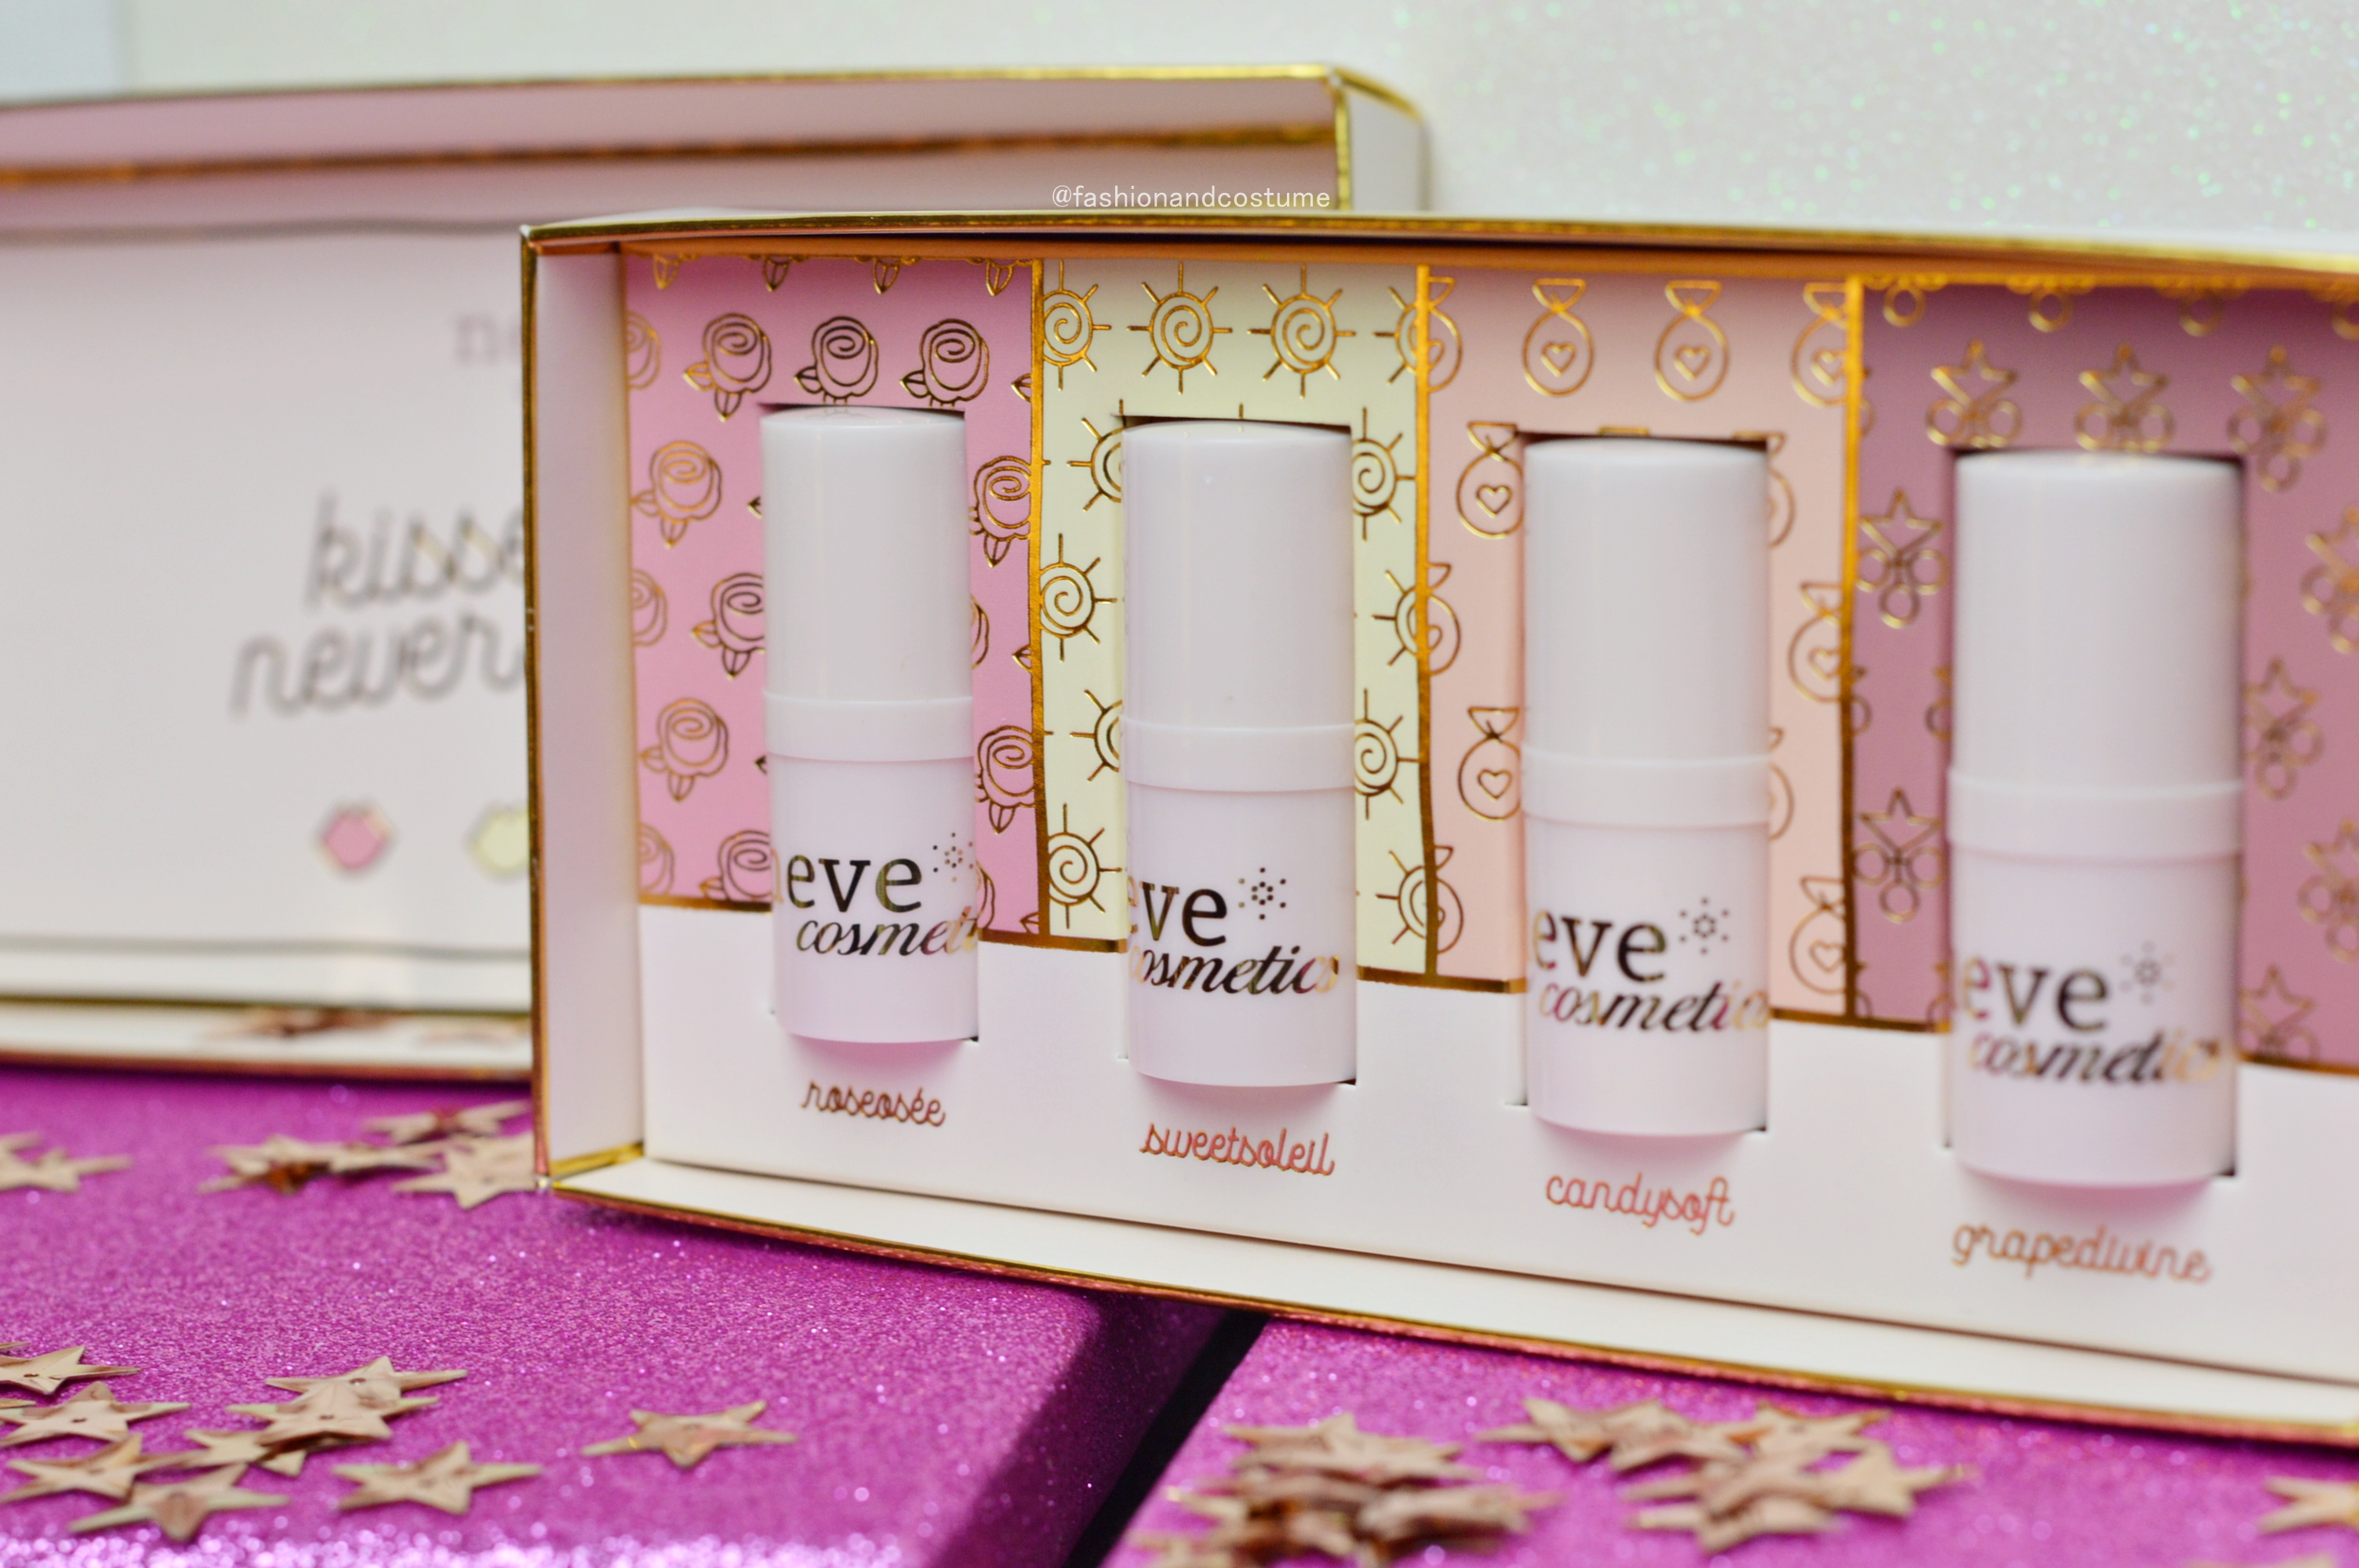 lippini-lipbalm-neve-cosmetics-naturale-labbra-idratate-idratare-roseosée-sweetsoleil-natale-promozione-grapedivine-candysoft-idratazione